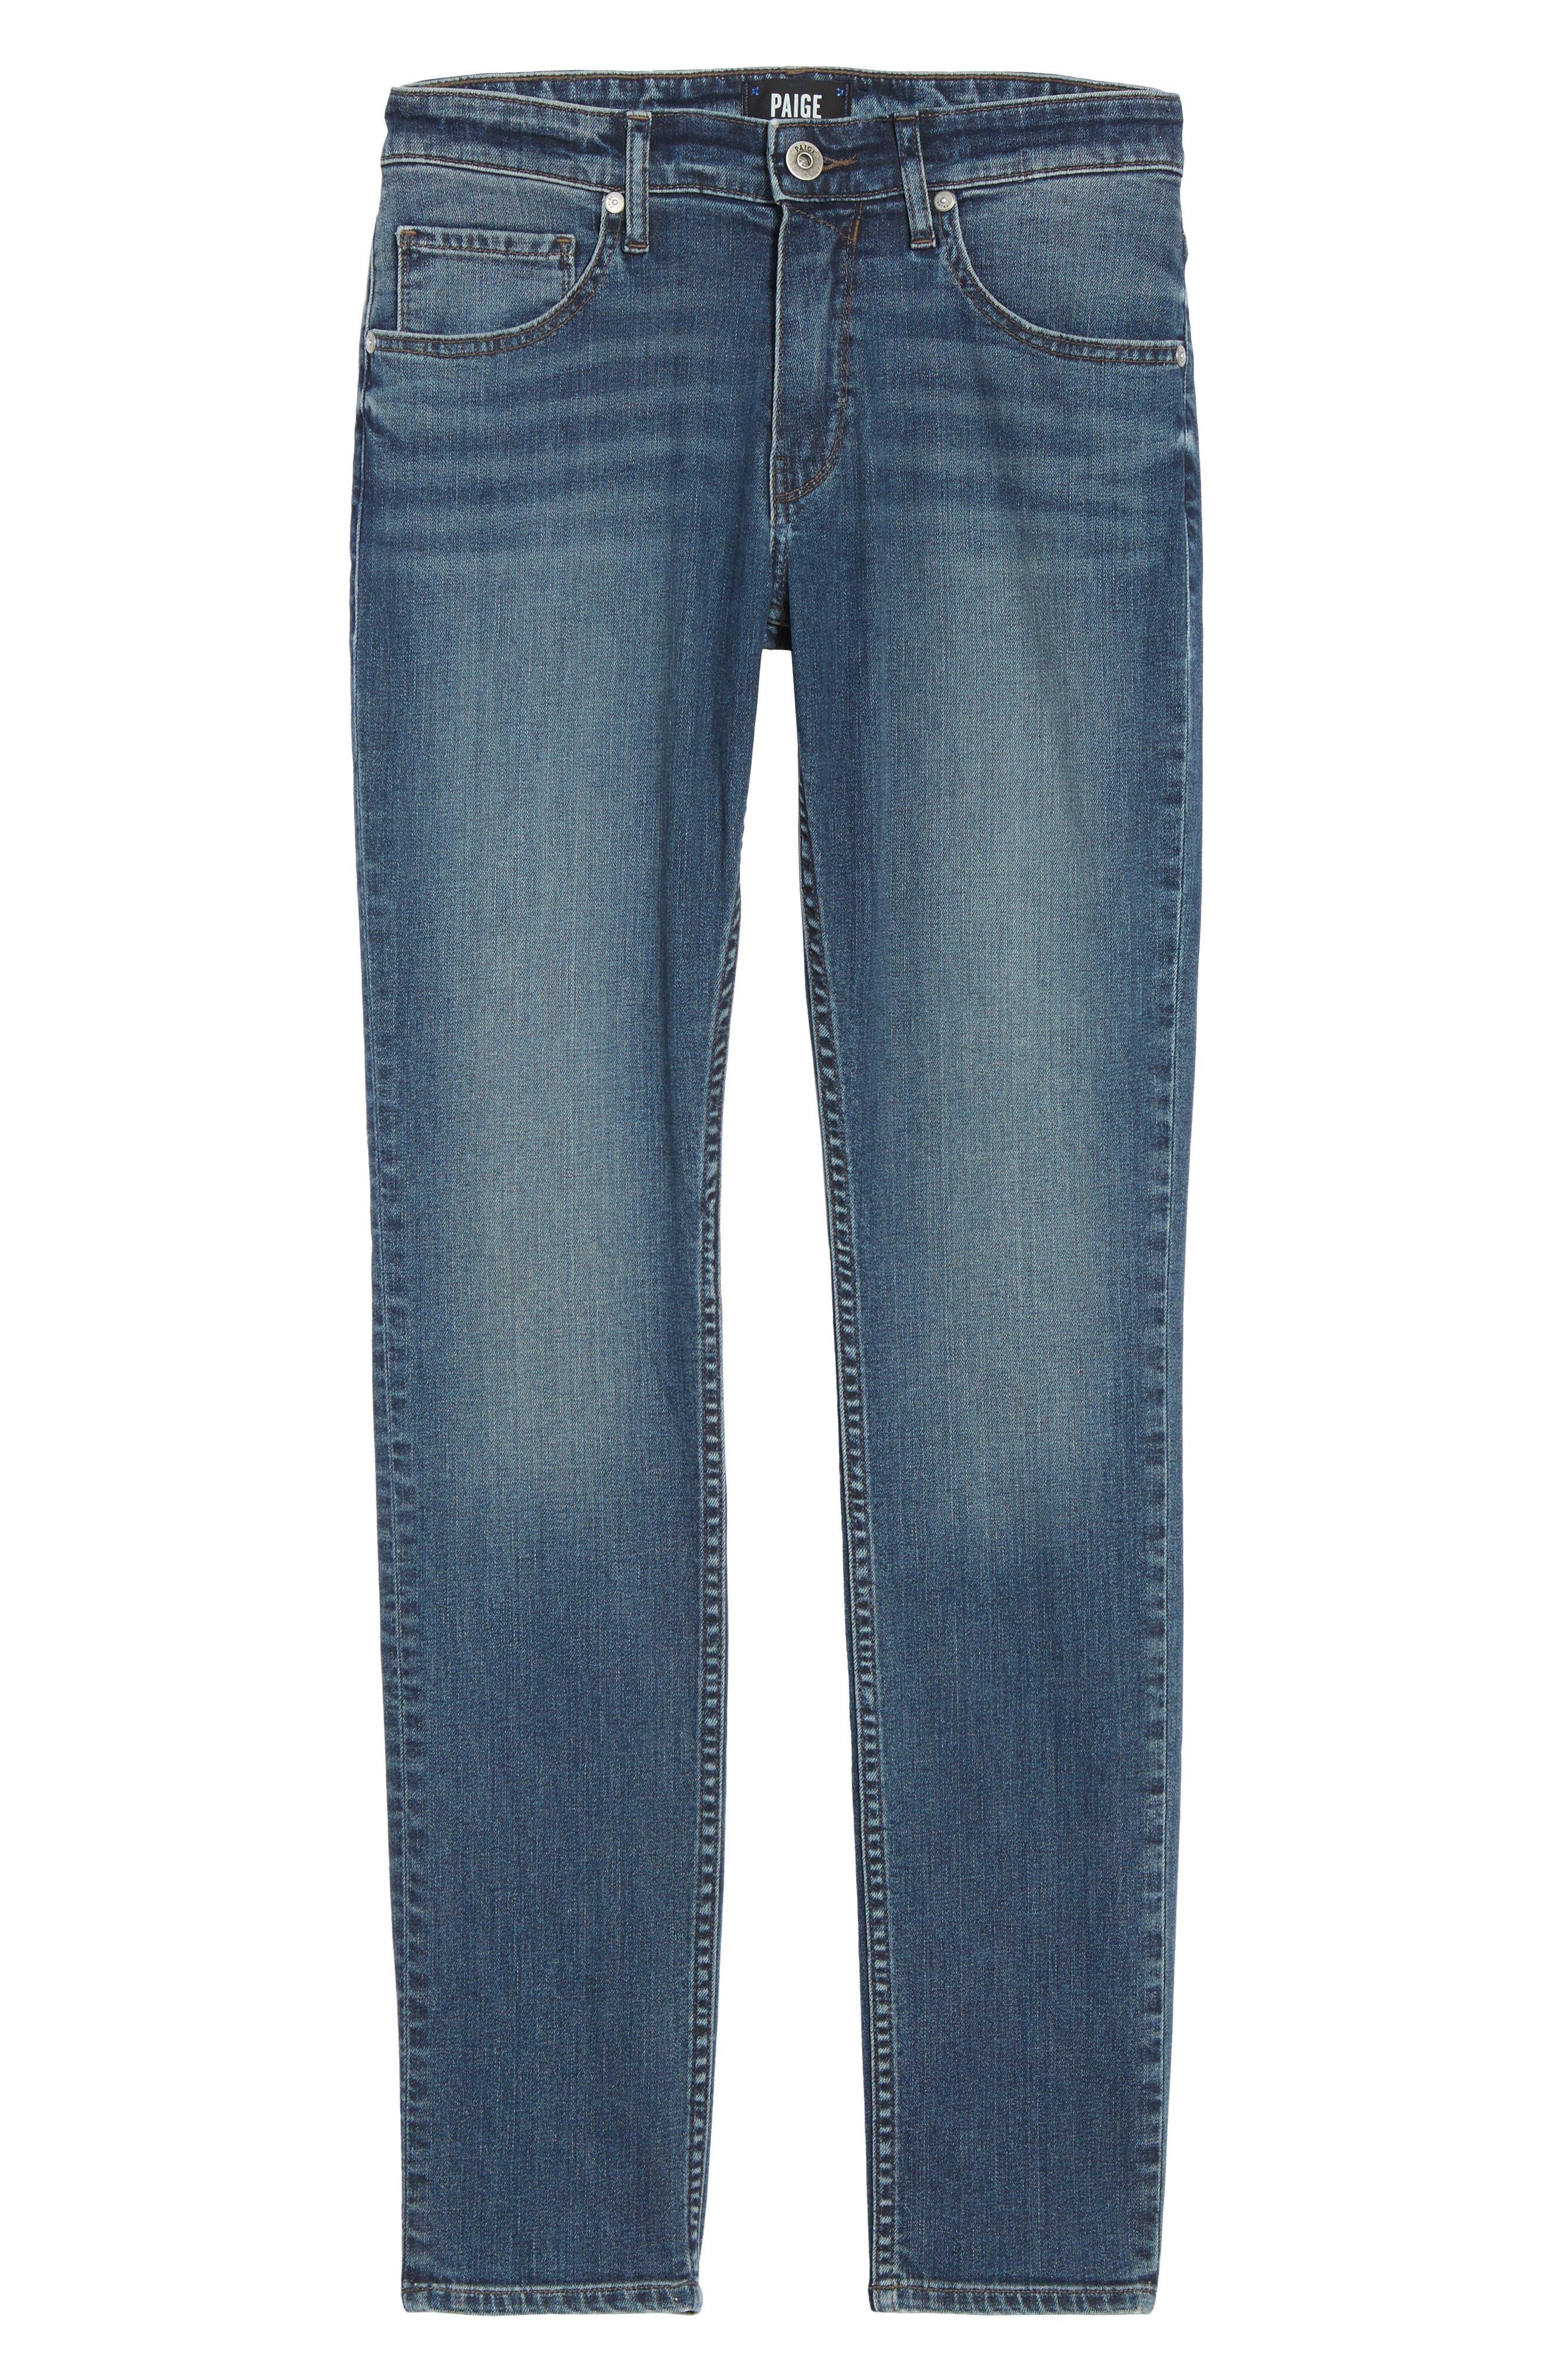 Legacy - Croft Skinny Jeans,                             Alternate thumbnail 6, color,                             400